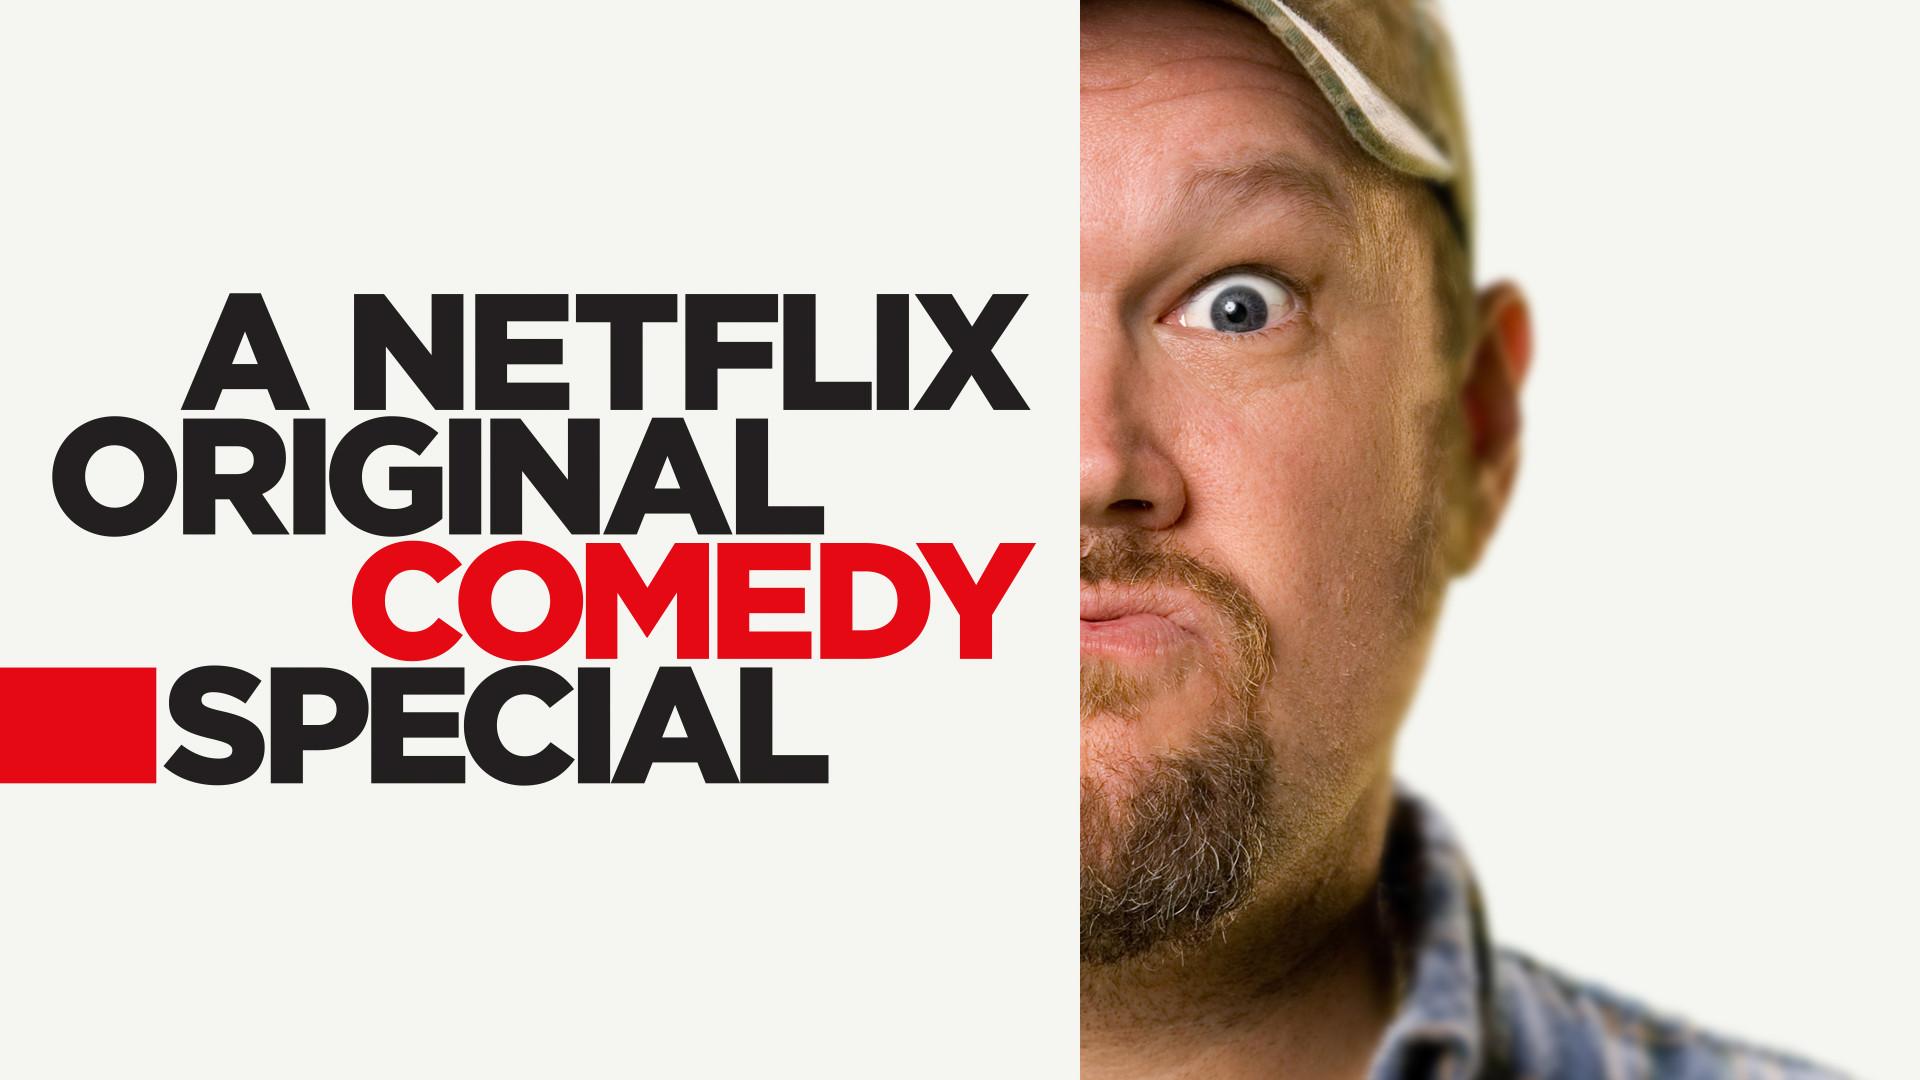 Netflix_Comedy_Styleguide_04b.jpg